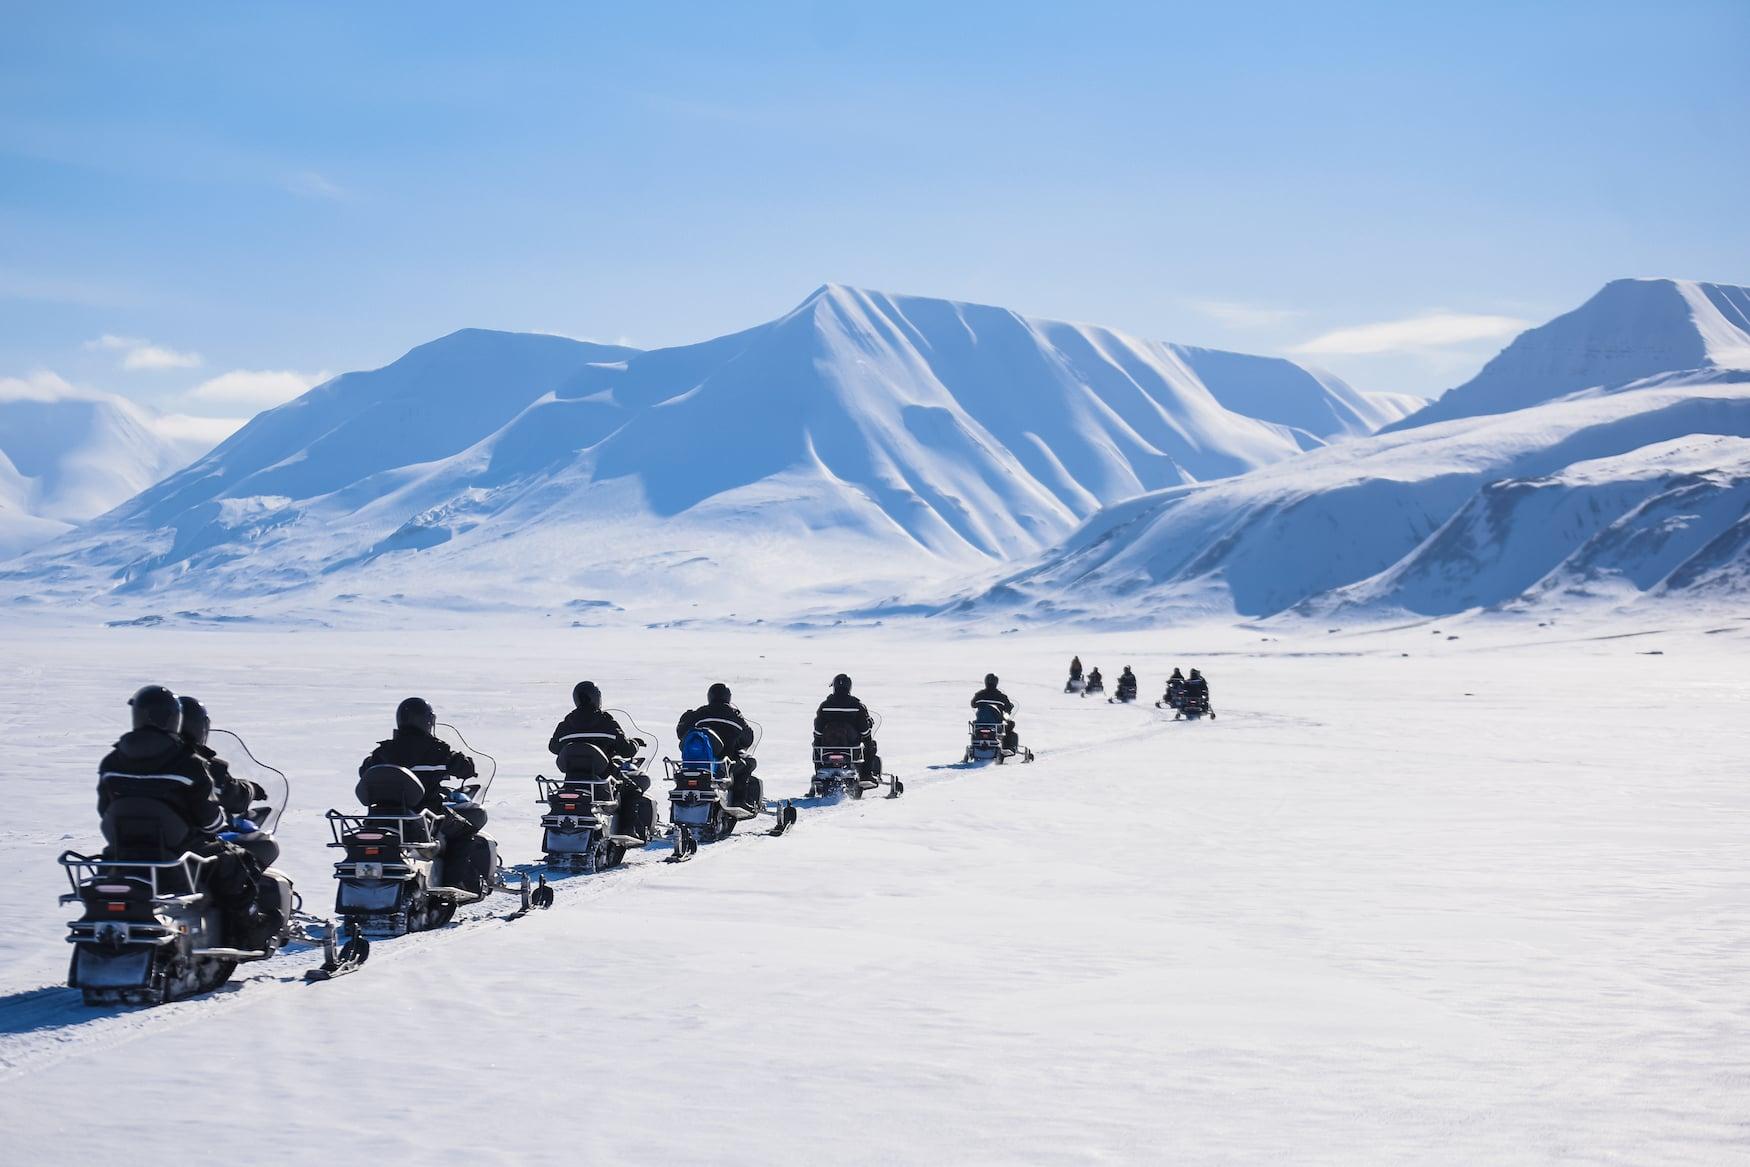 Schneemobil-Tour durch Svalbard in Norwegen